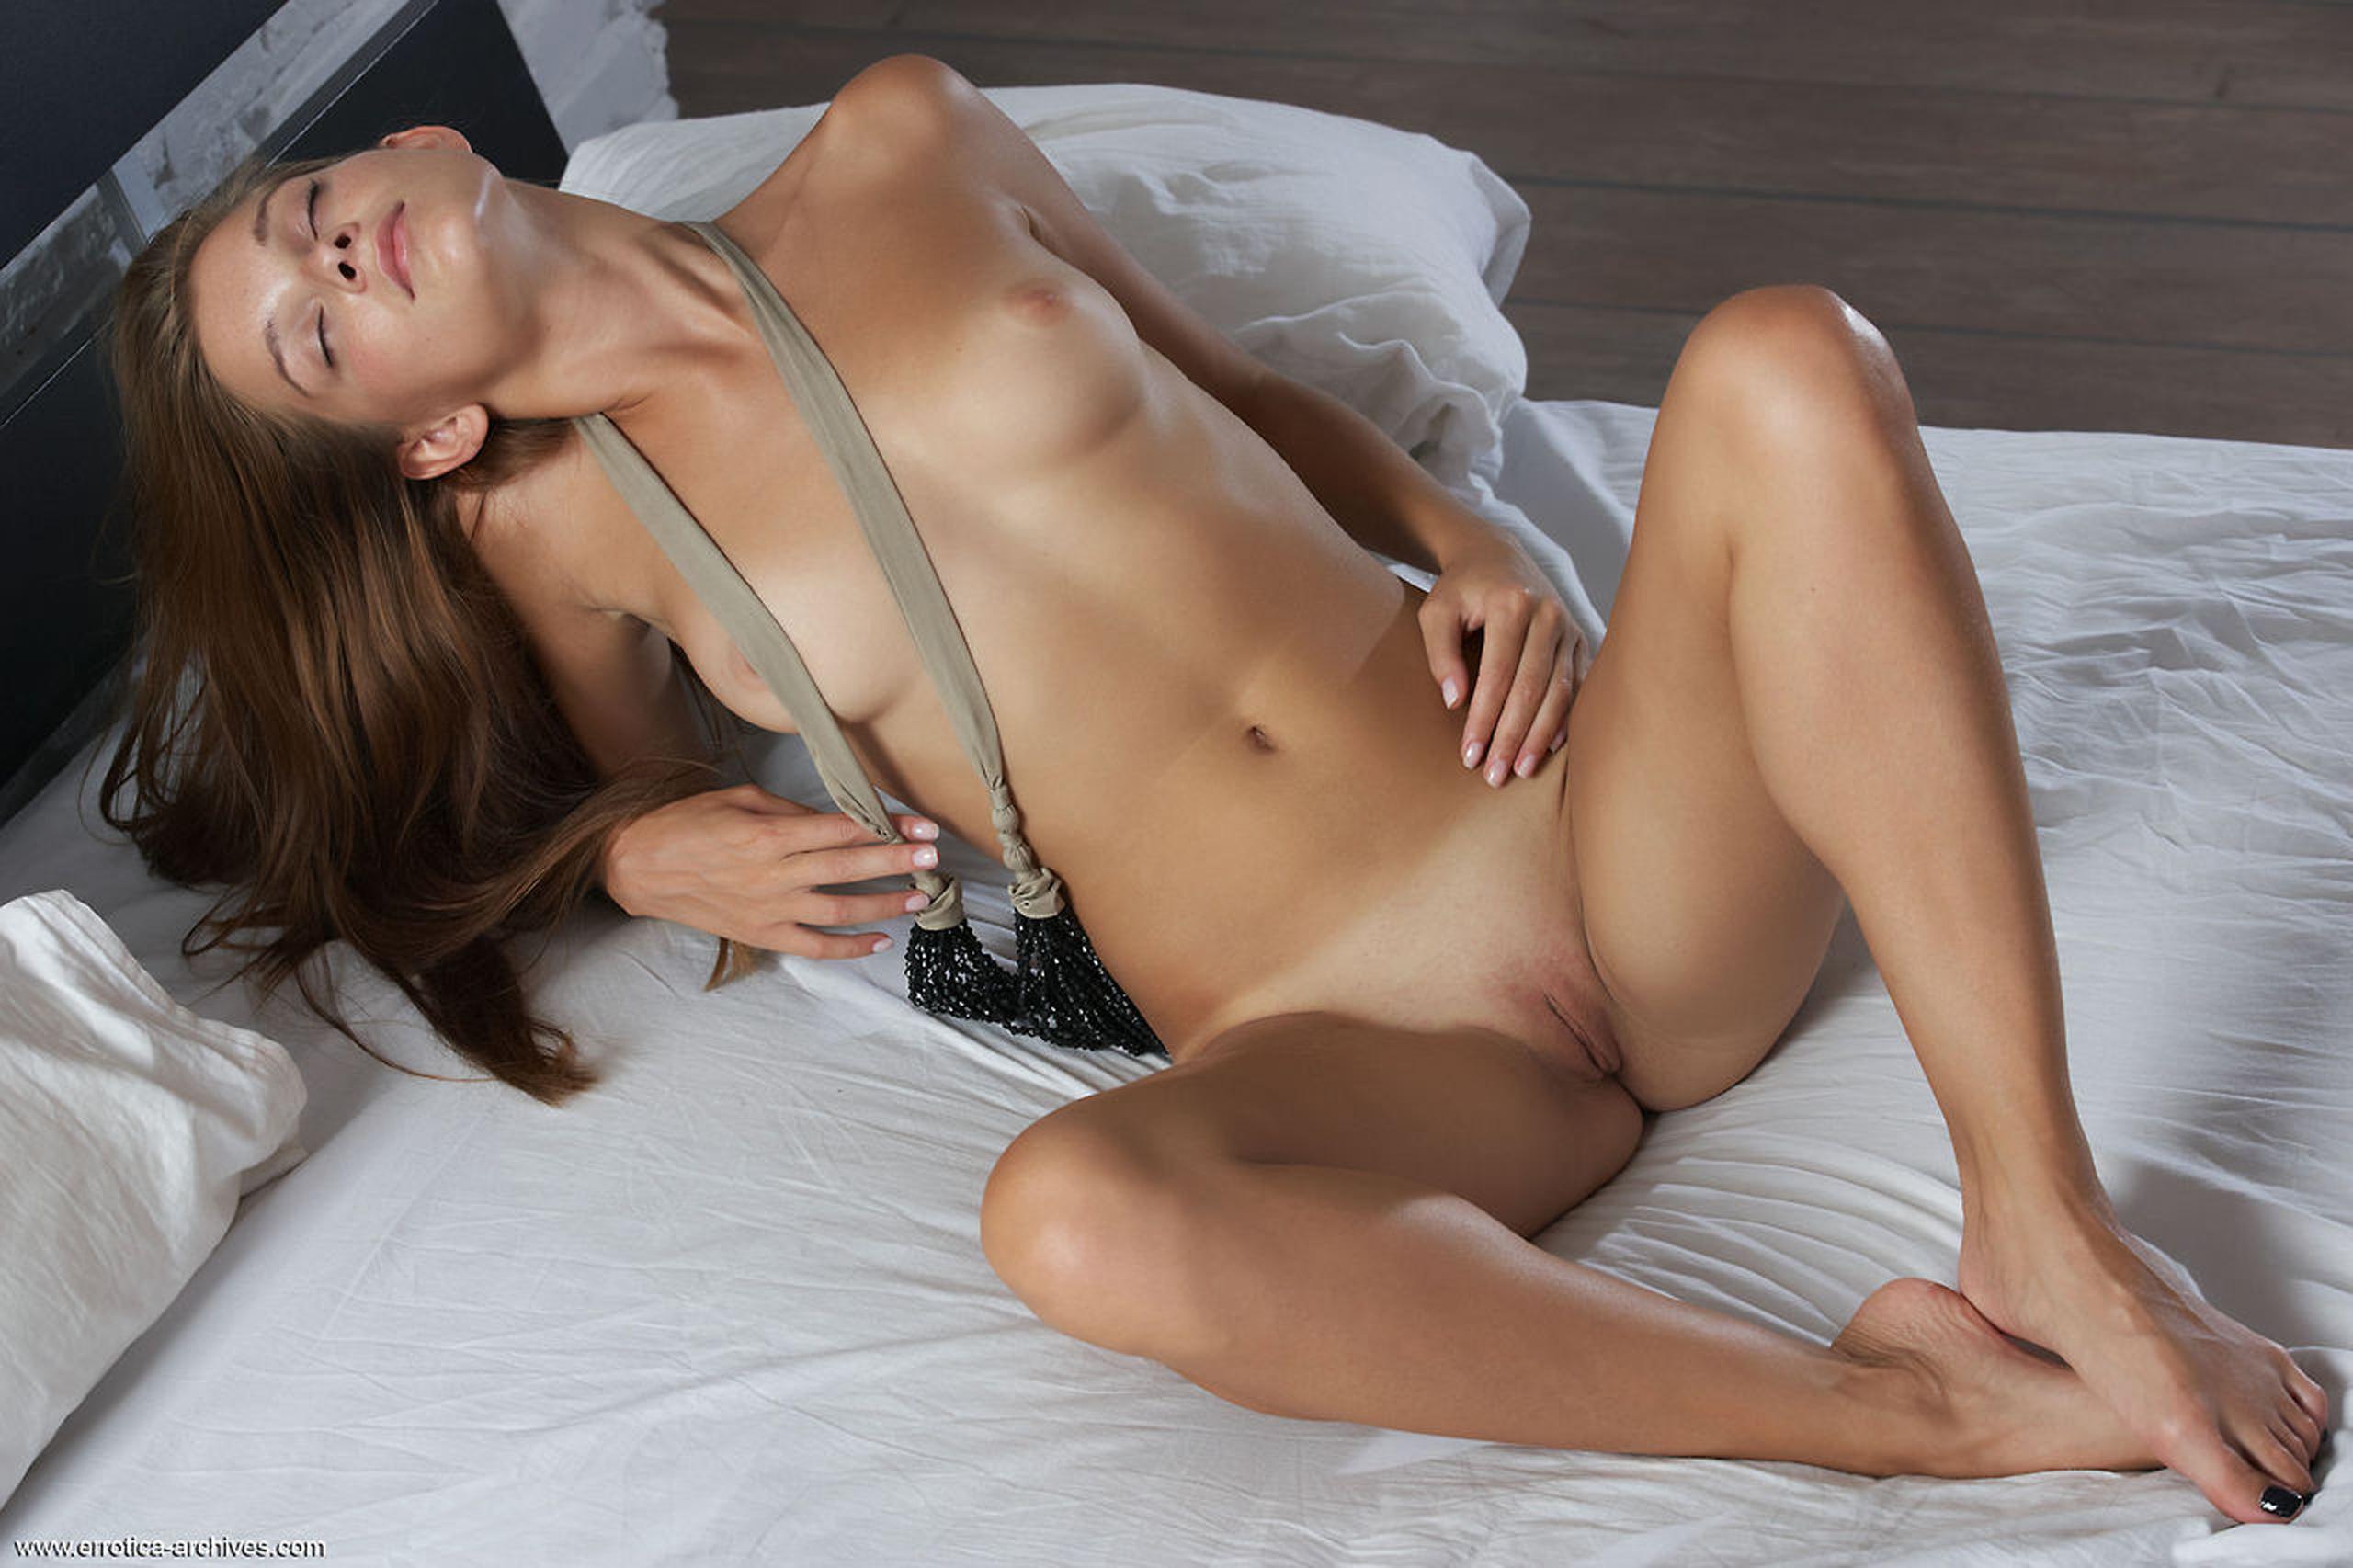 Wallpaper Belle, Brunette, Sexy, Hot, Nude, Cute, Teen -1804